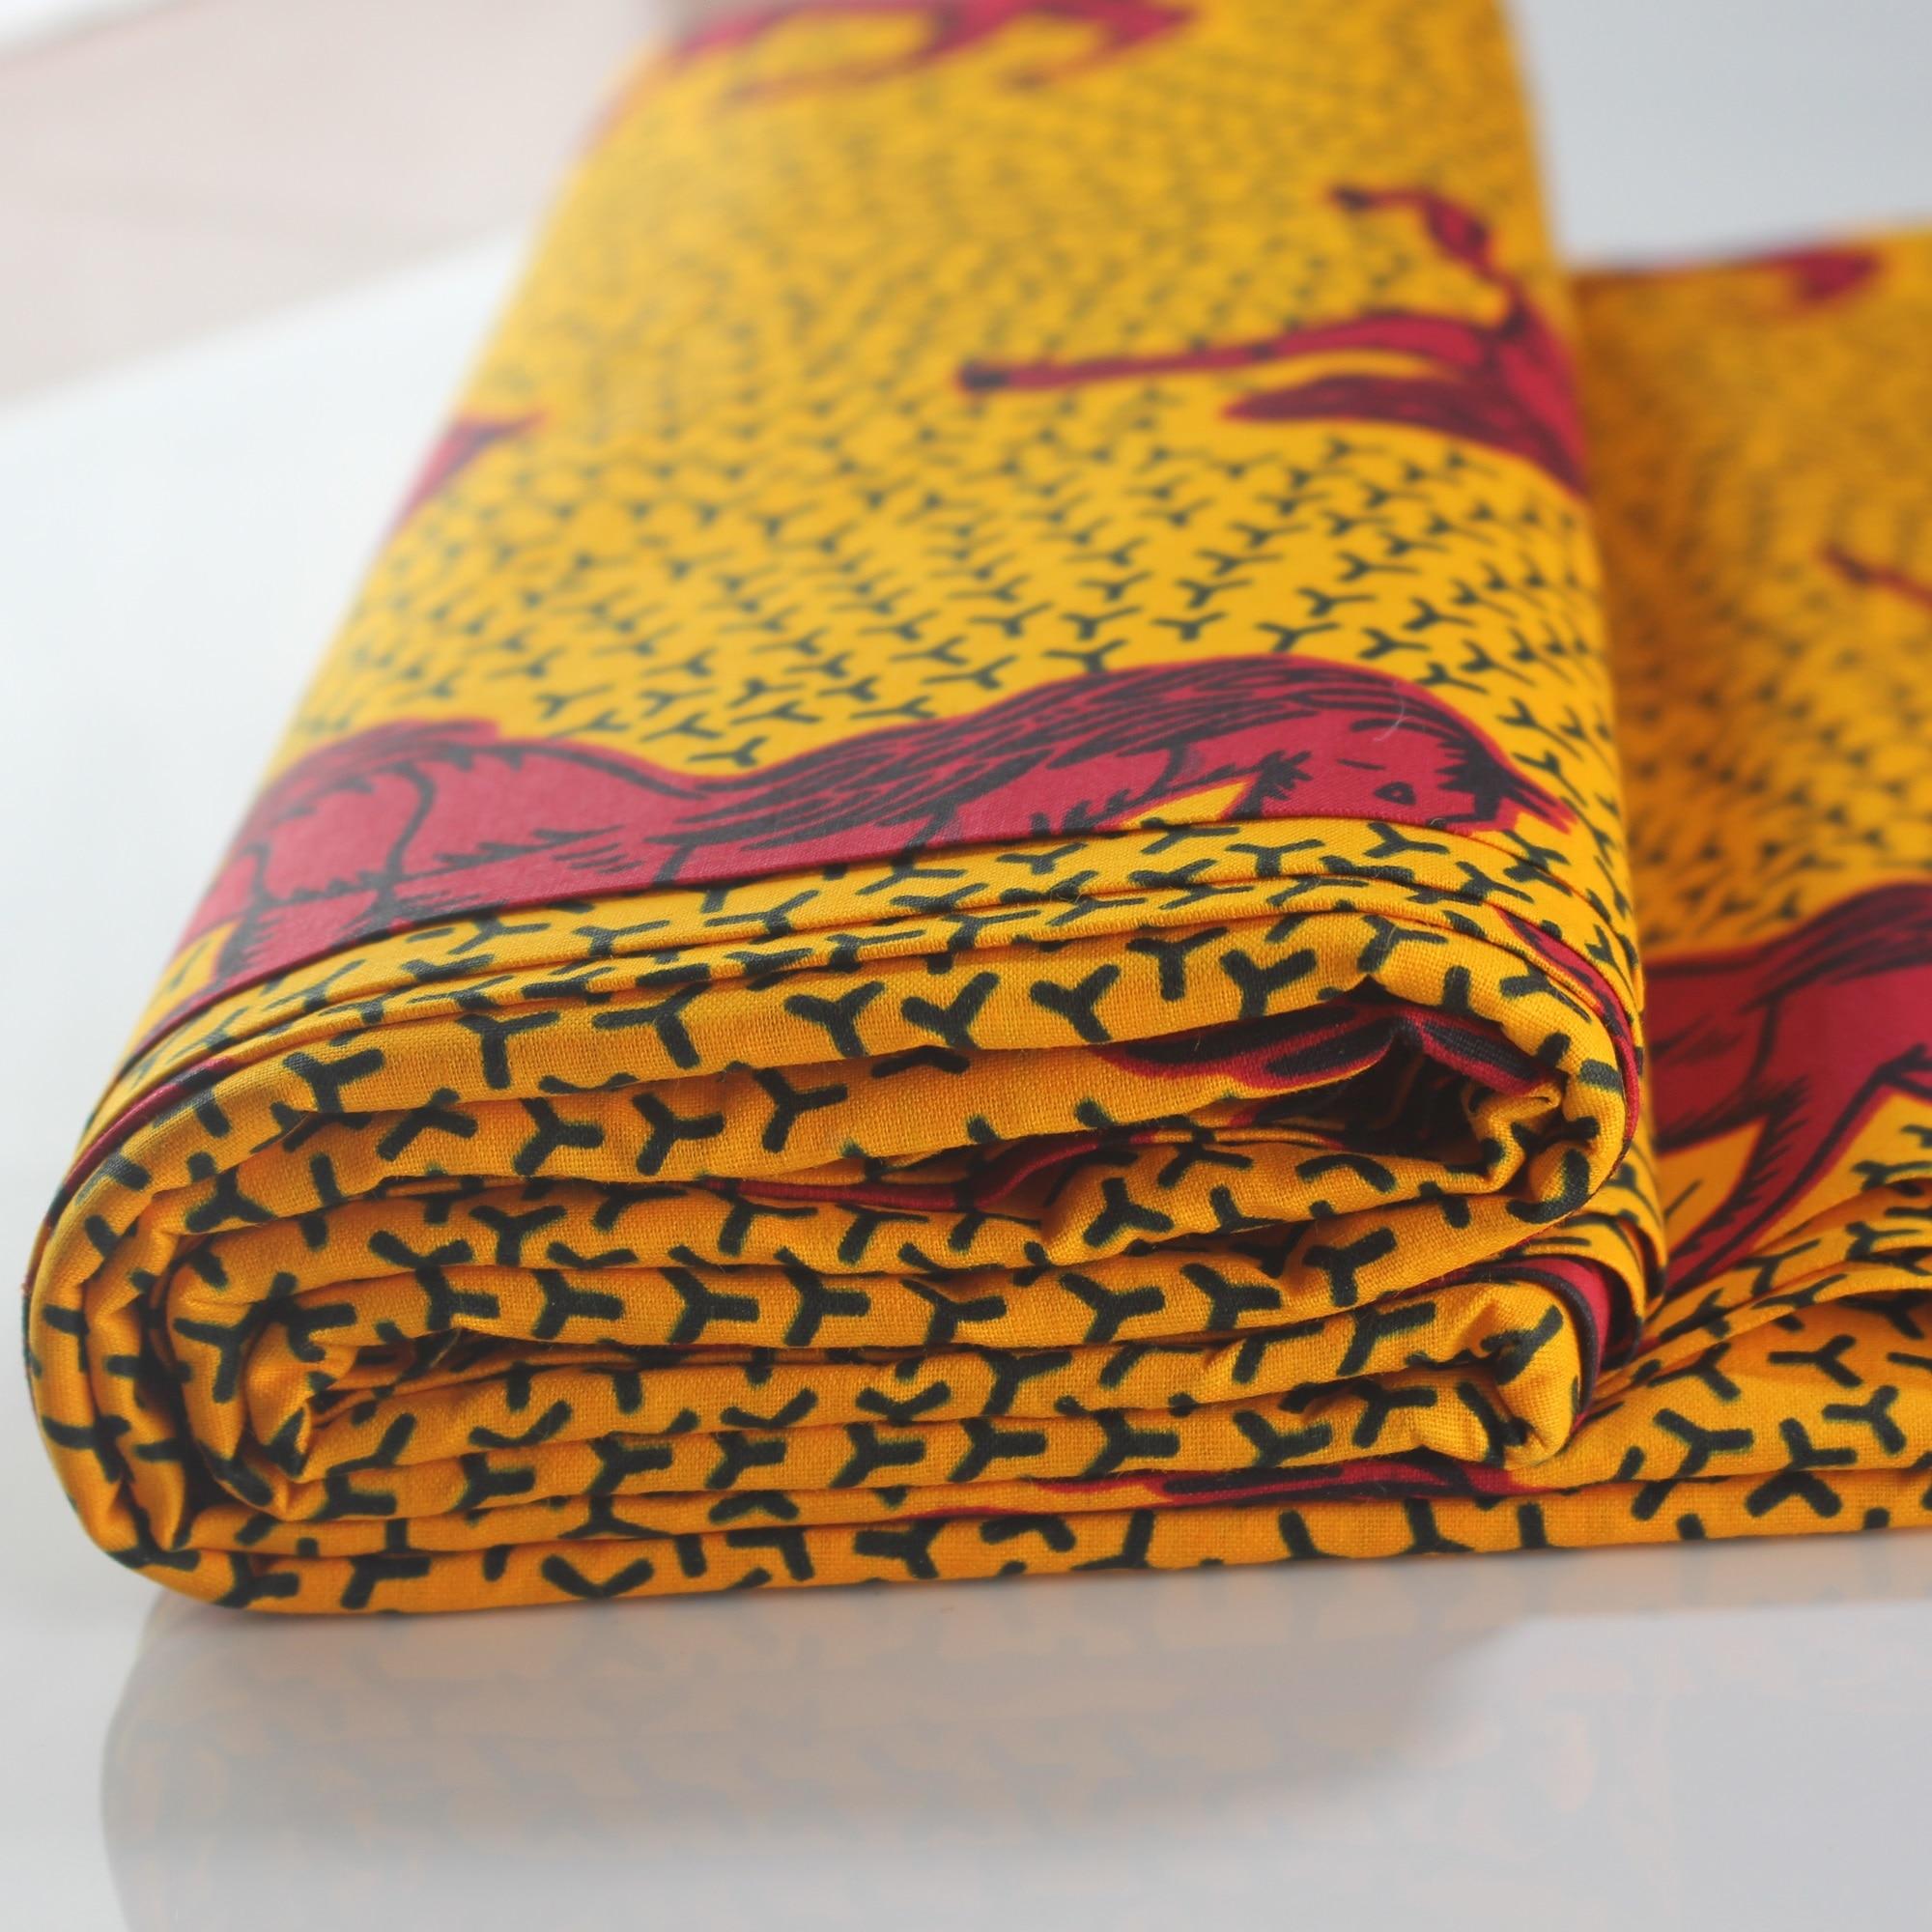 African Fabrics African Print Fabric 6 Yards Latest Veritable Wax Guaranteed Real Dutch Wax For Women